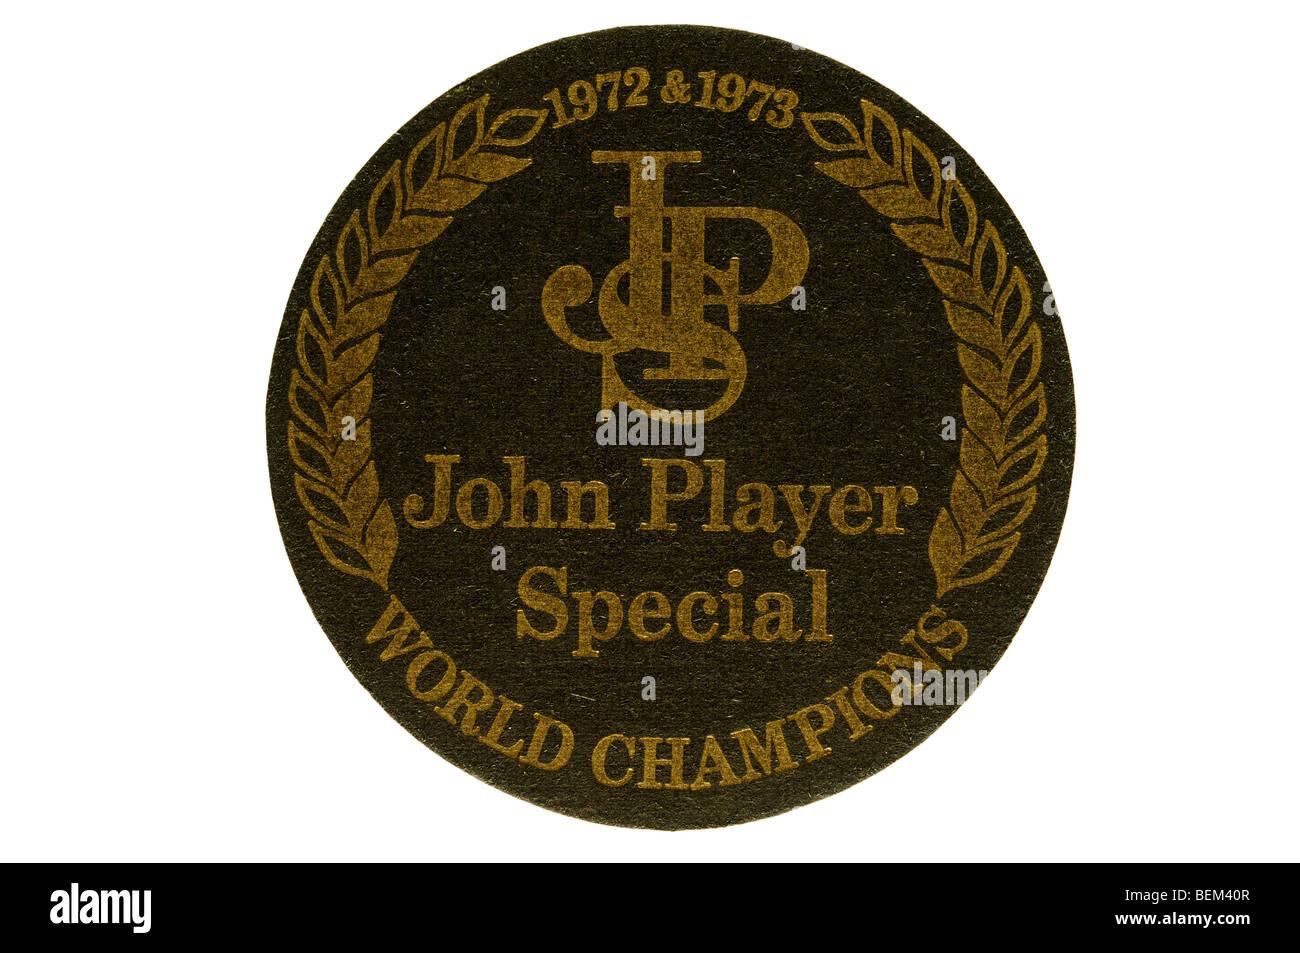 1972 & 1973 JSP john player special world championships - Stock Image